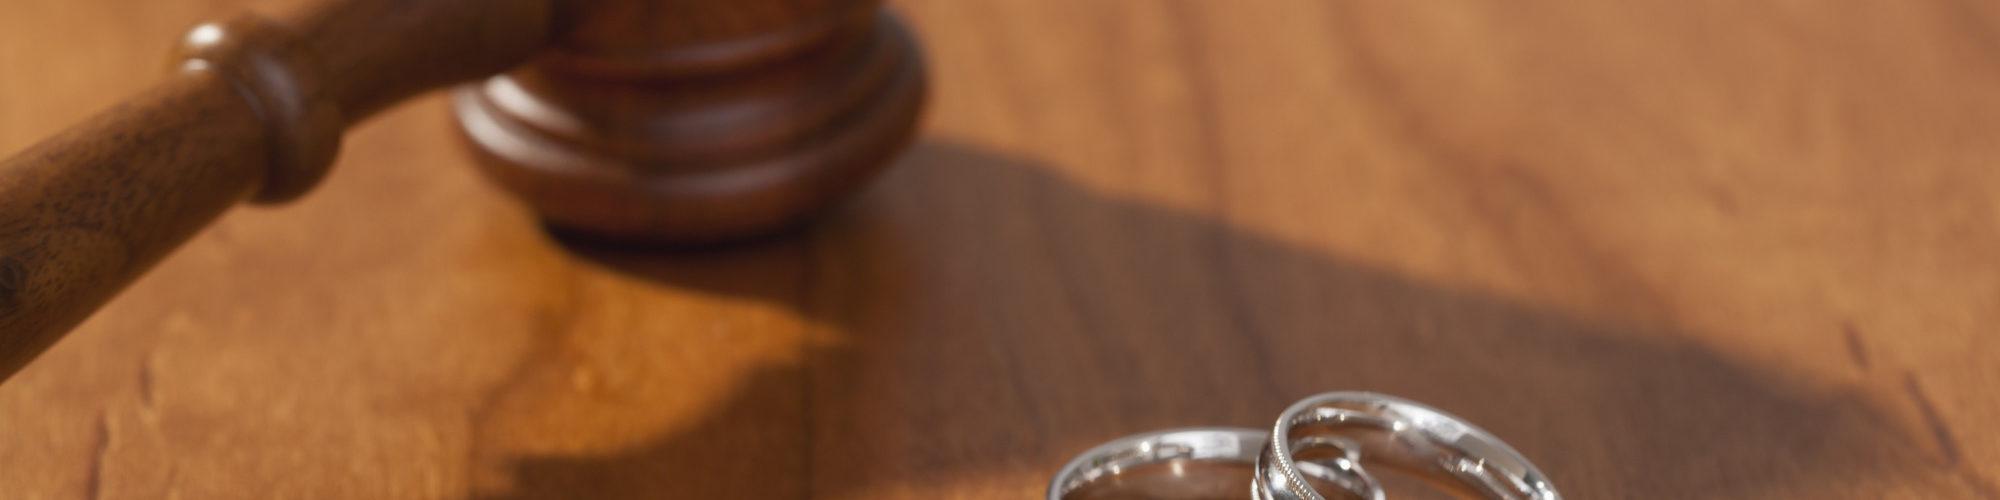 Юрист по семейному праву в городе Москва